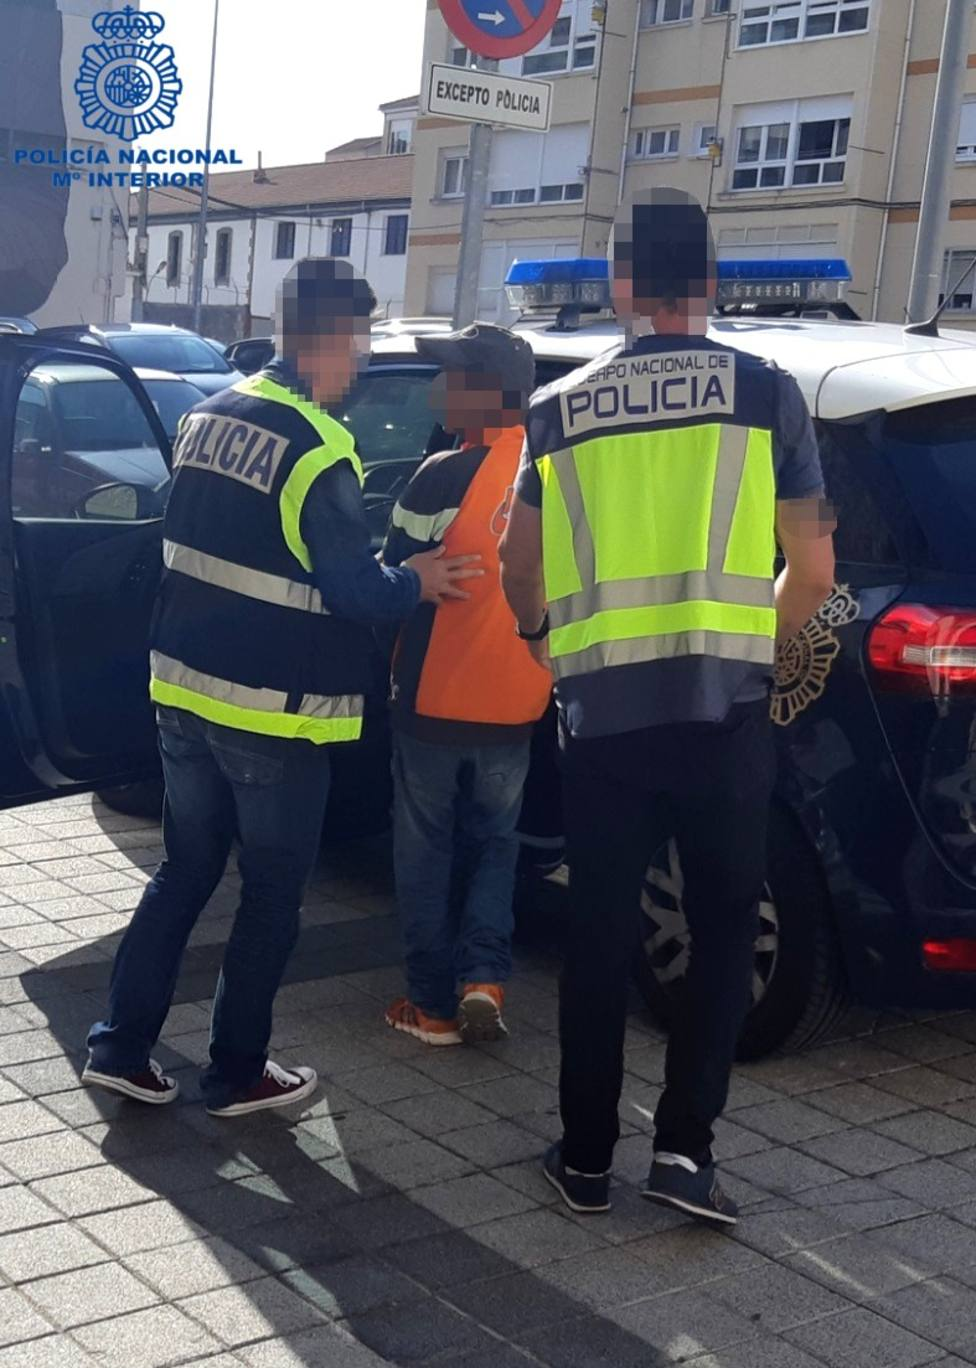 Detenido un hombre en Cantabria por trata de seres humanos